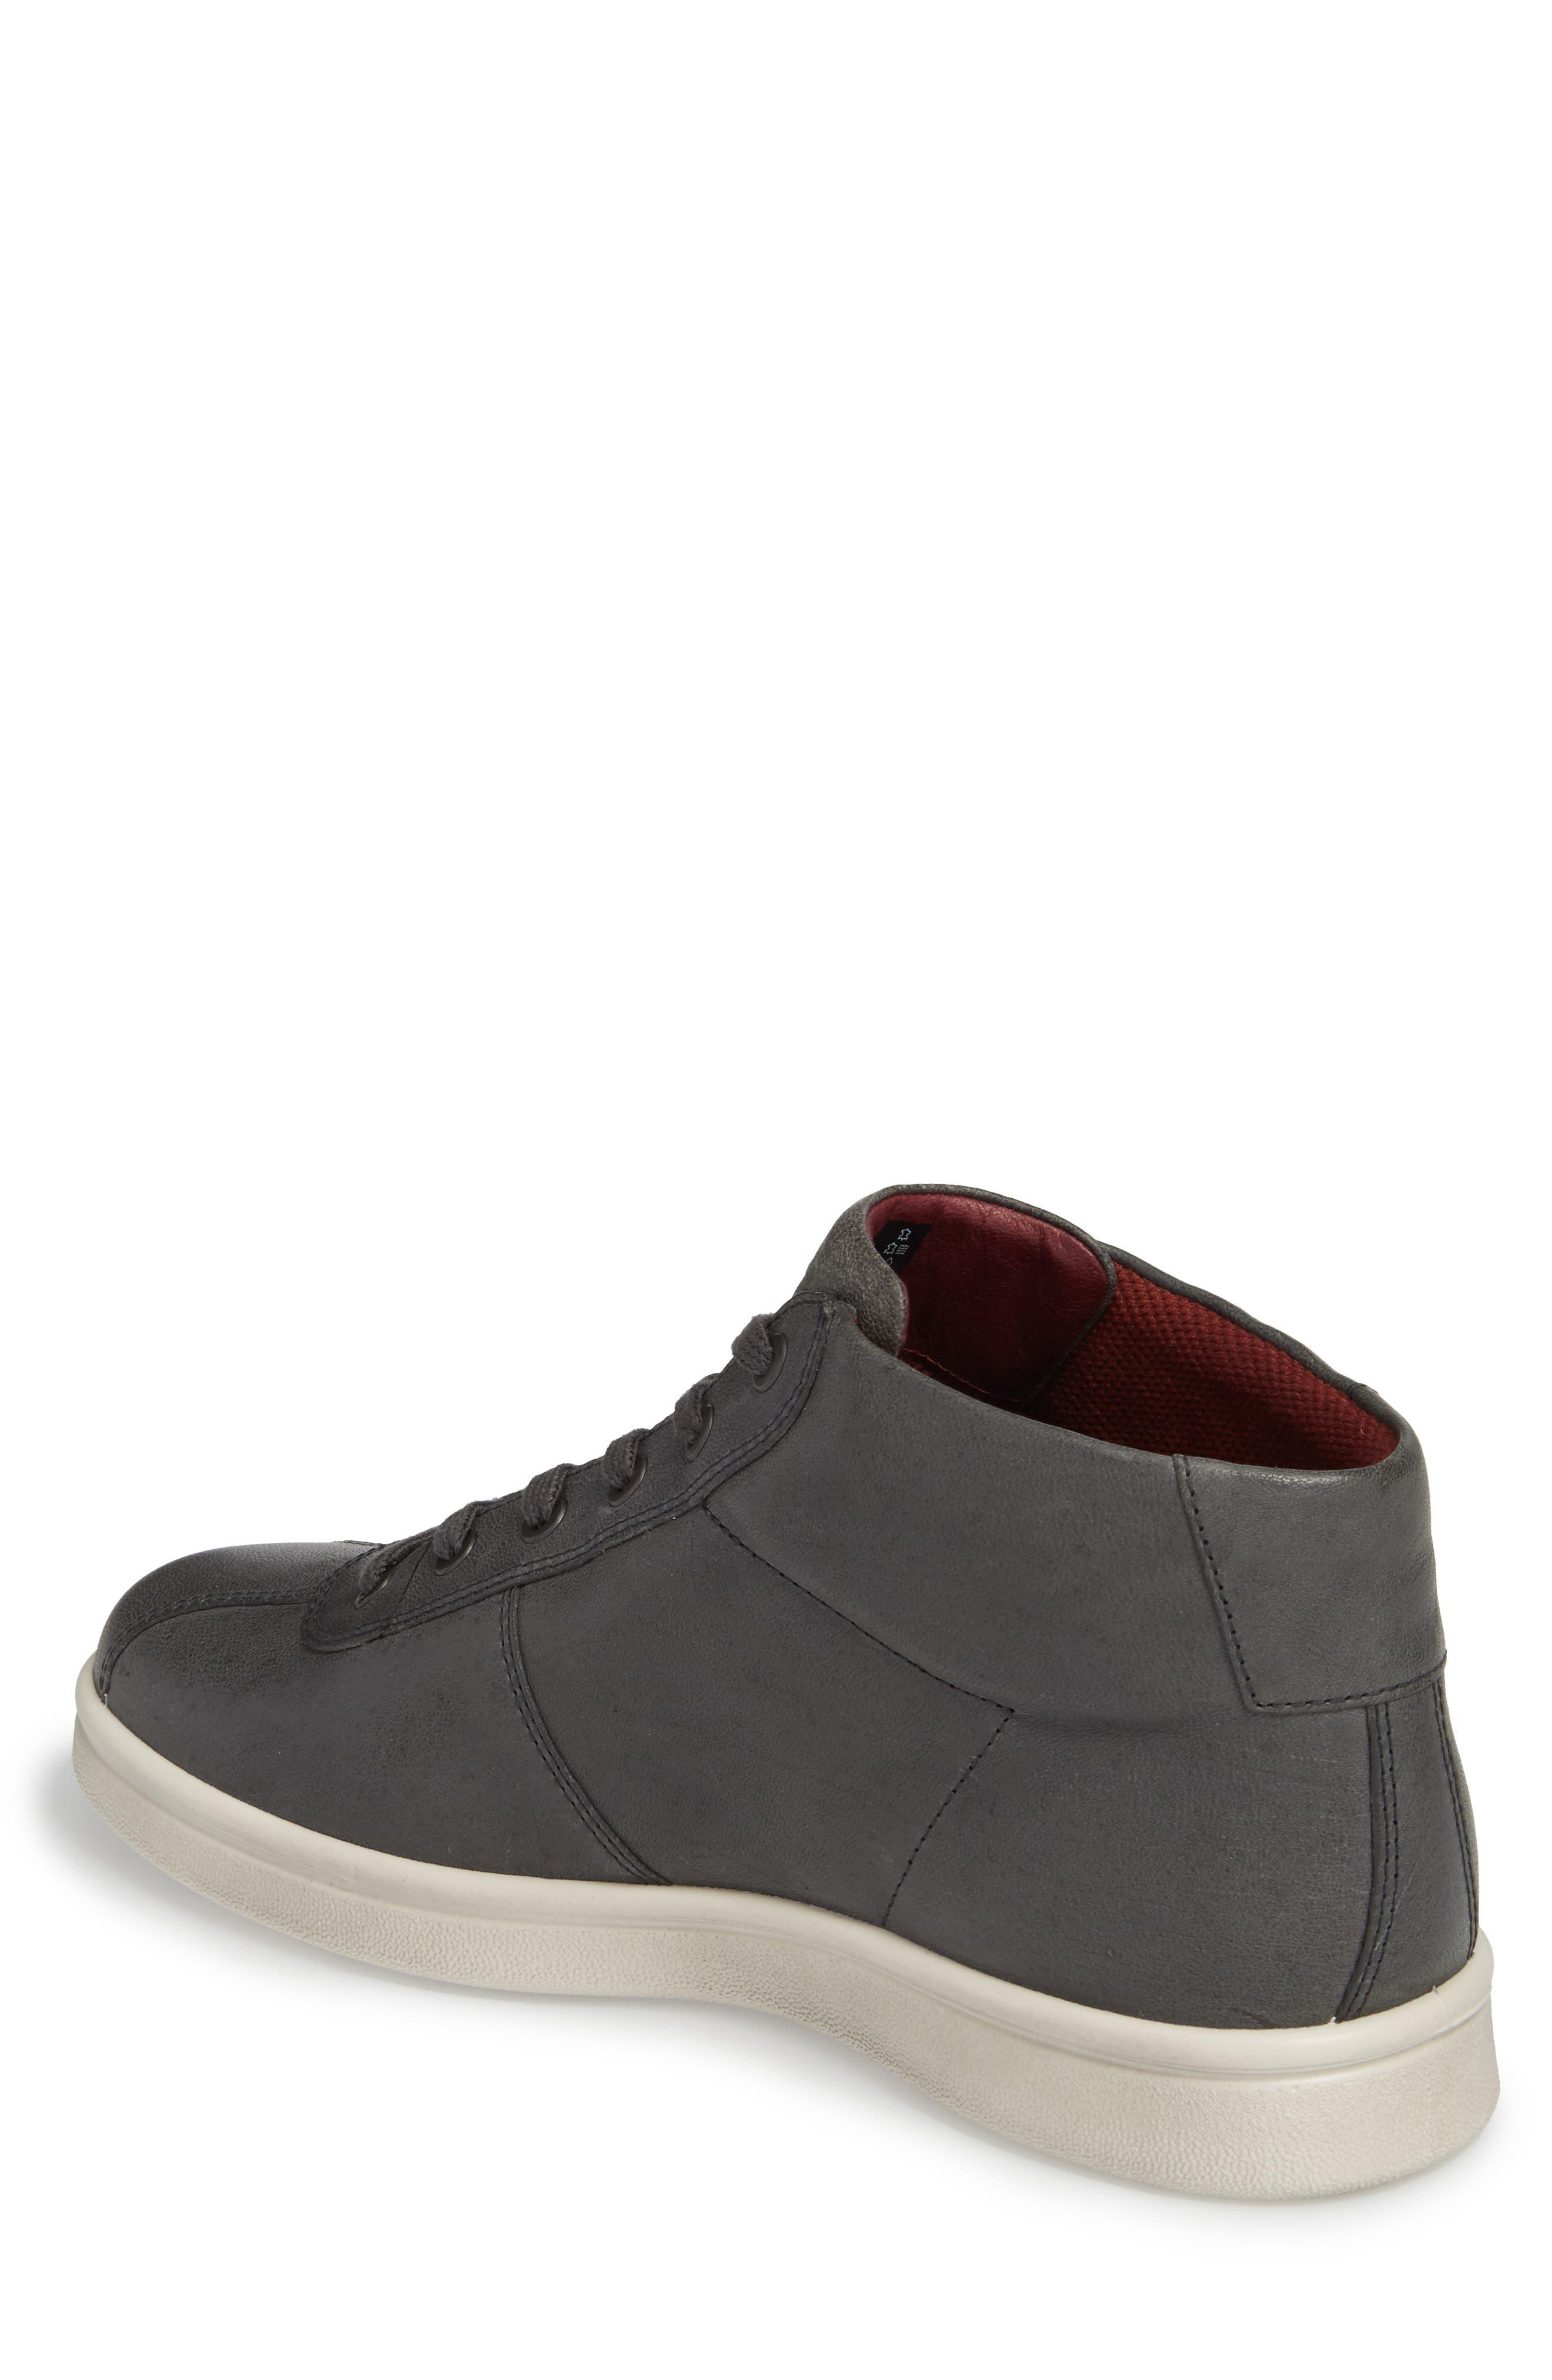 Kallum High Top Sneaker,                             Alternate thumbnail 2, color,                             078